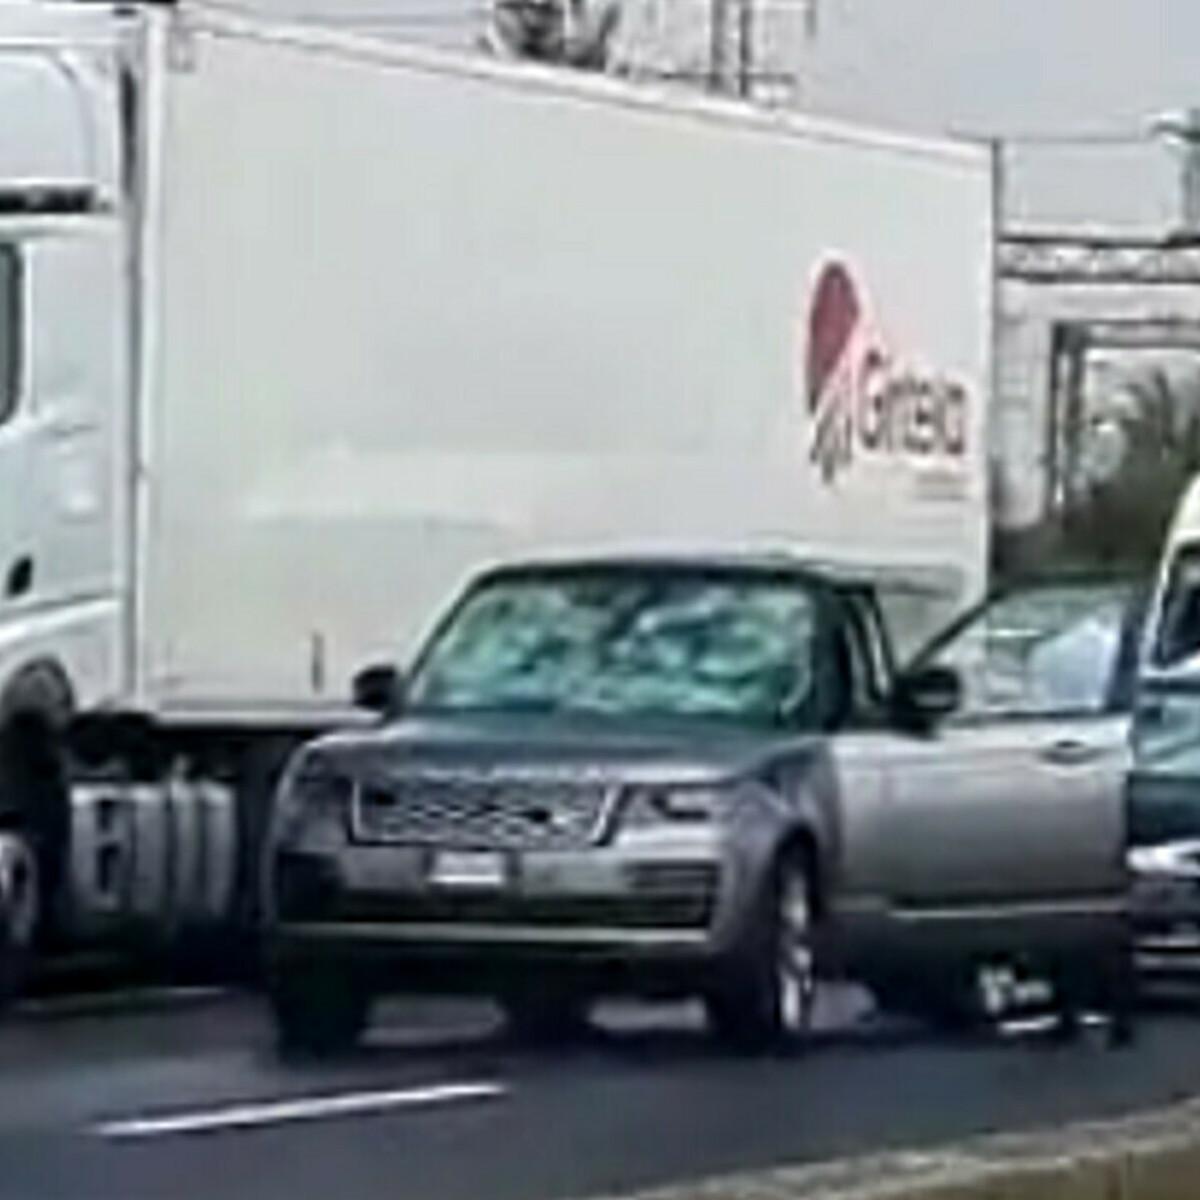 "Violenta grandinata in autostrada: decine di vetture ""crivellate"", disagi al traffico"